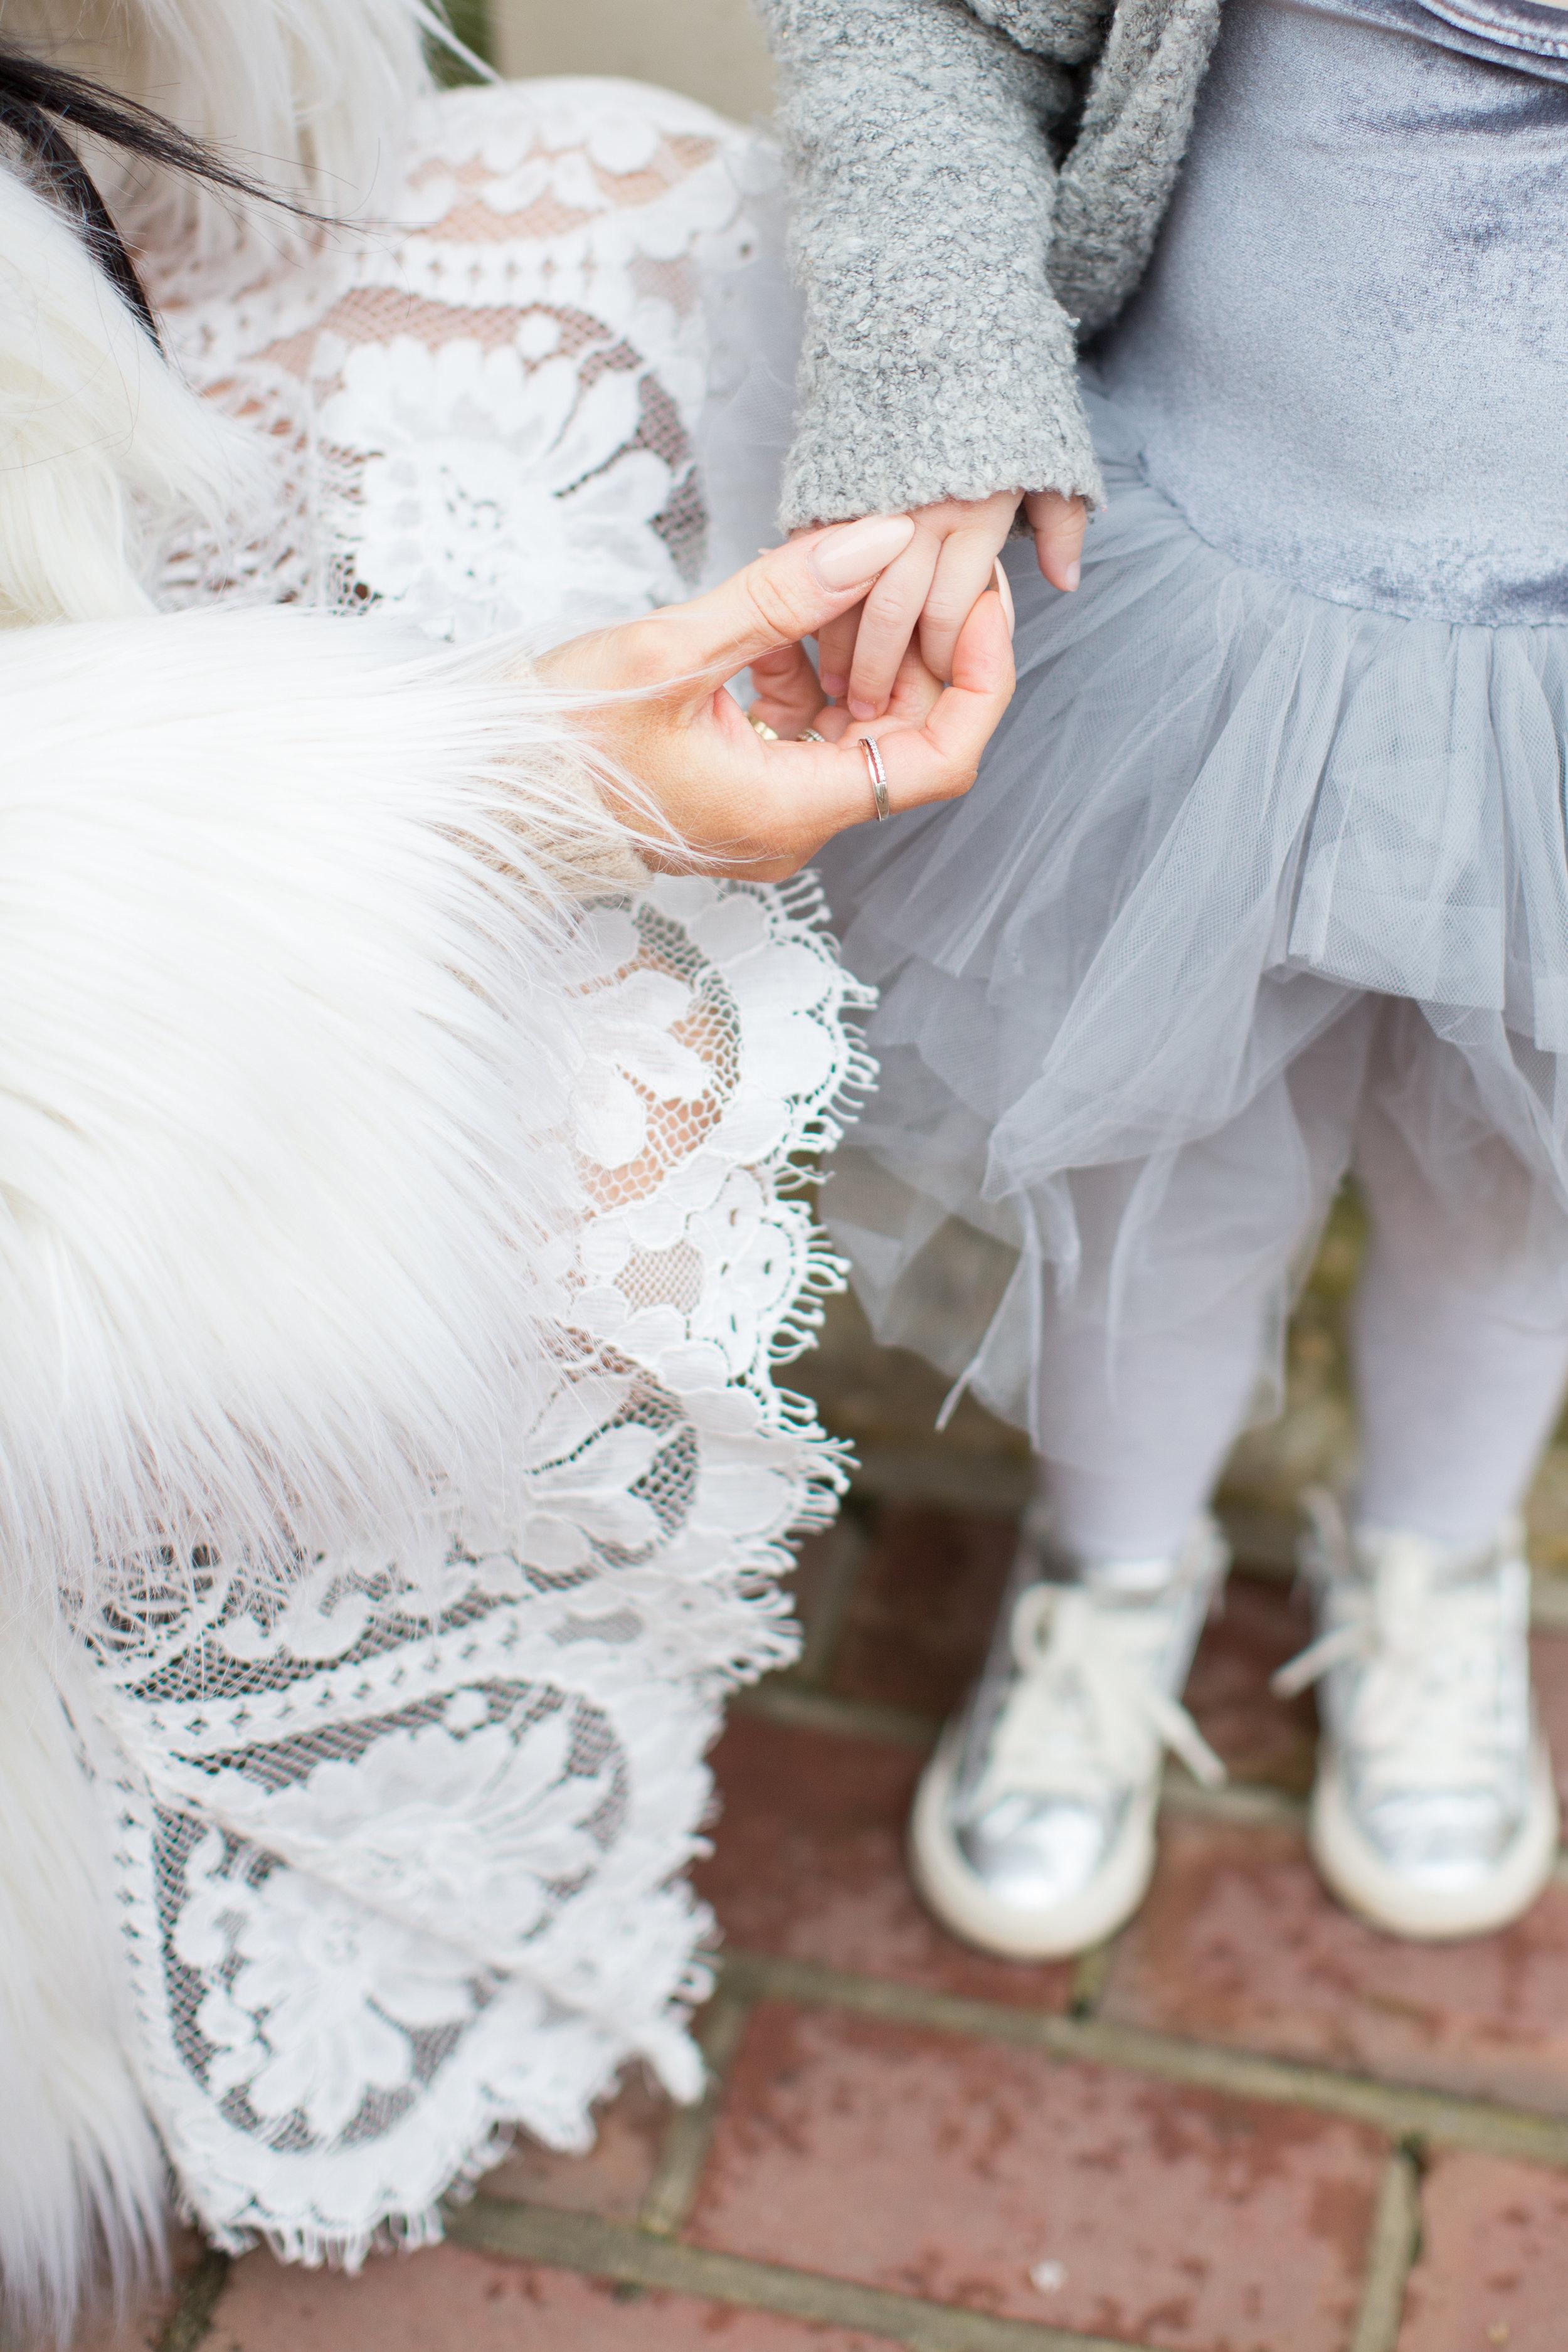 Maternity Family Photo Shoot DC Photographer Jessica Burdge_NatalieStrahorn_3